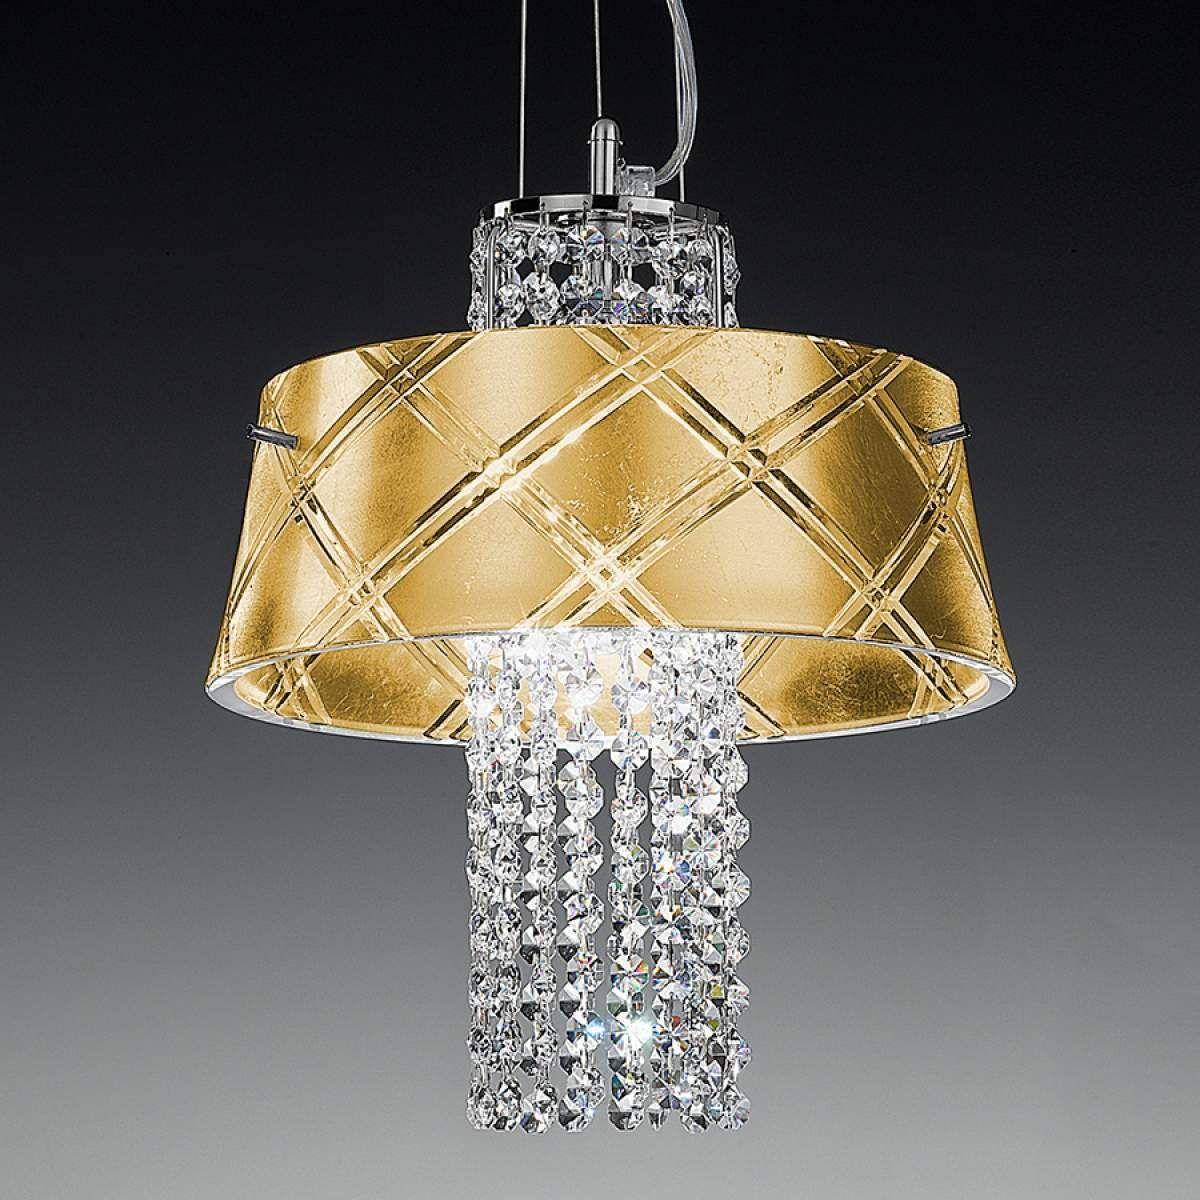 Stehlampe Led Dimmbar Fernbedienung Pendelleuchte Kristall Led